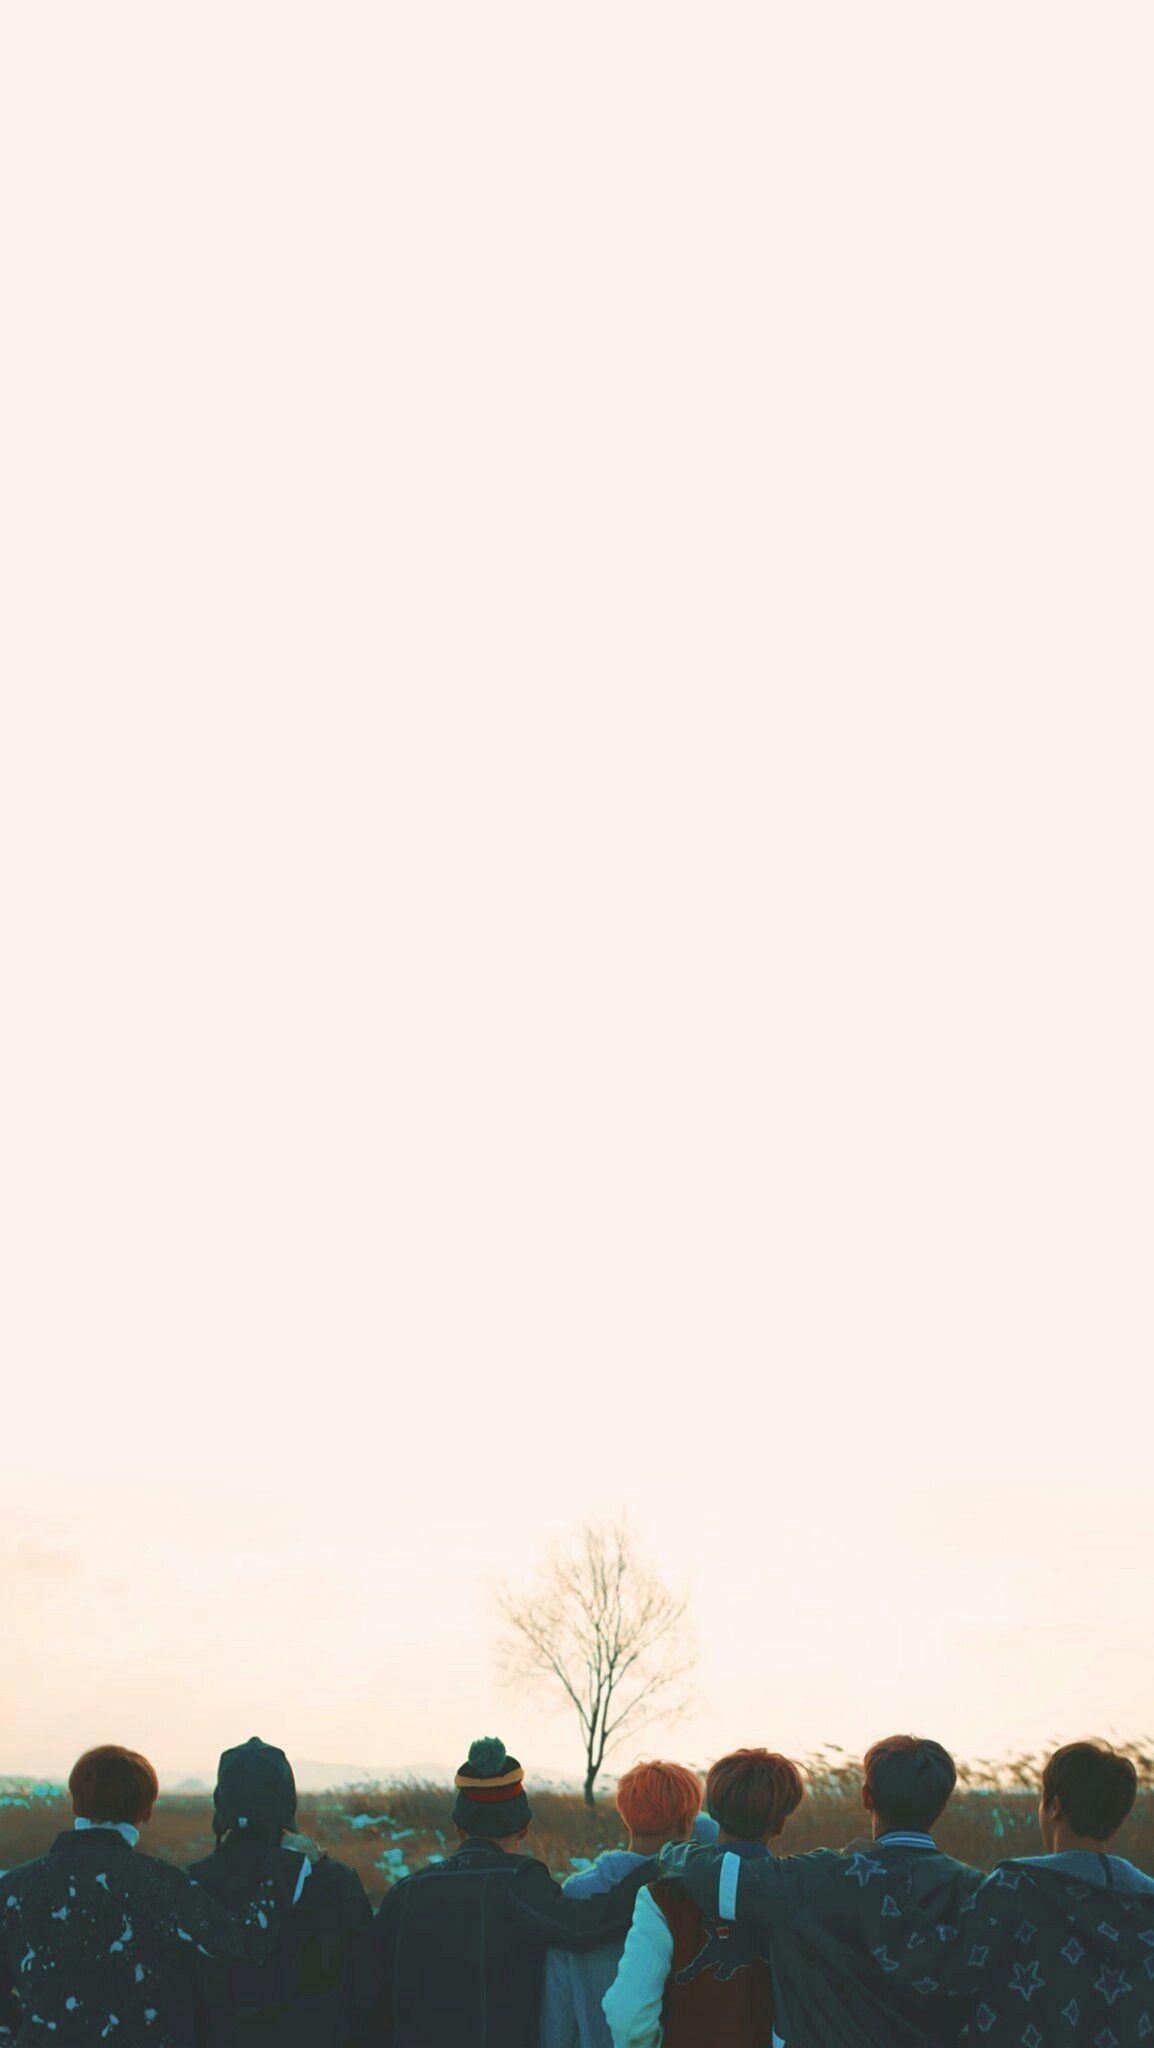 Bts iphone wallpaper tumblr - Spring Day Bts Ynwa Springday Wallpaper Backgroundsiphone